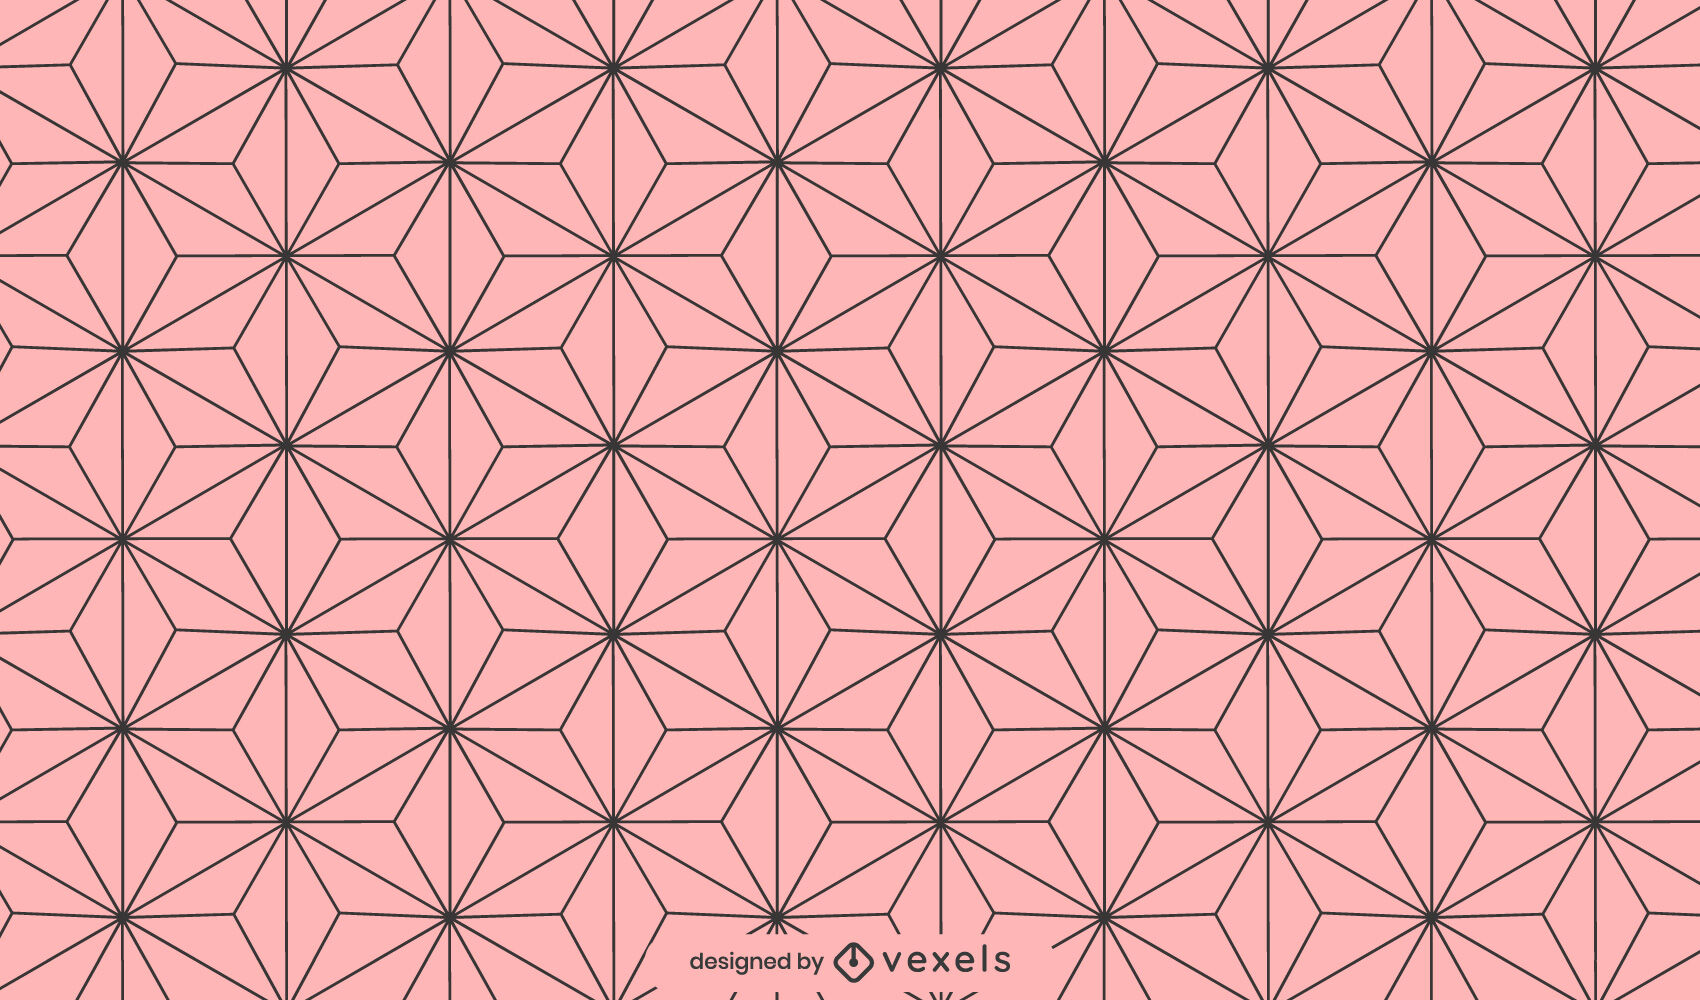 Asanoha leaves geometric pattern design